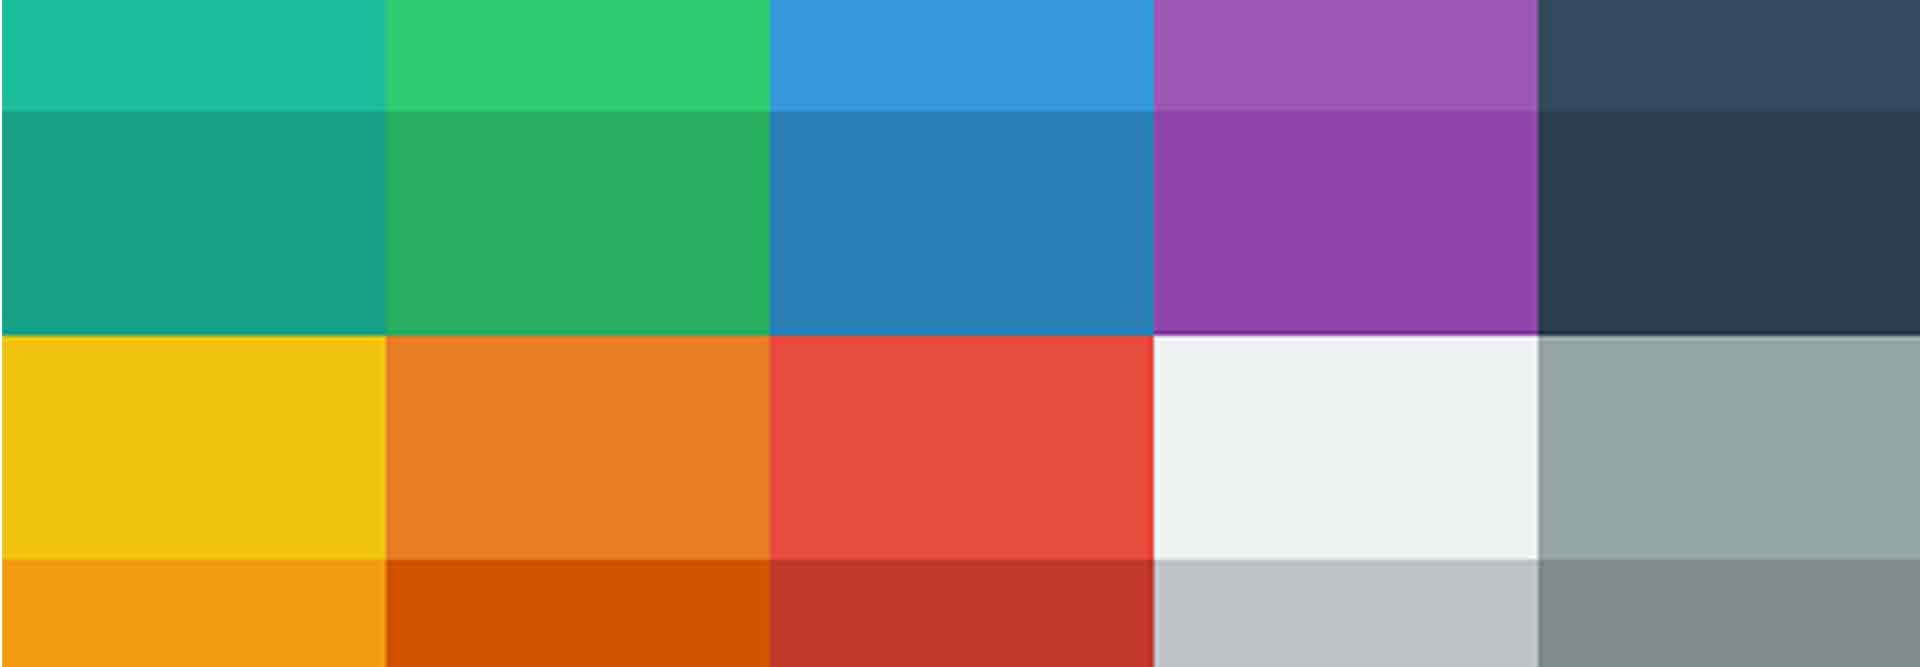 color-viz